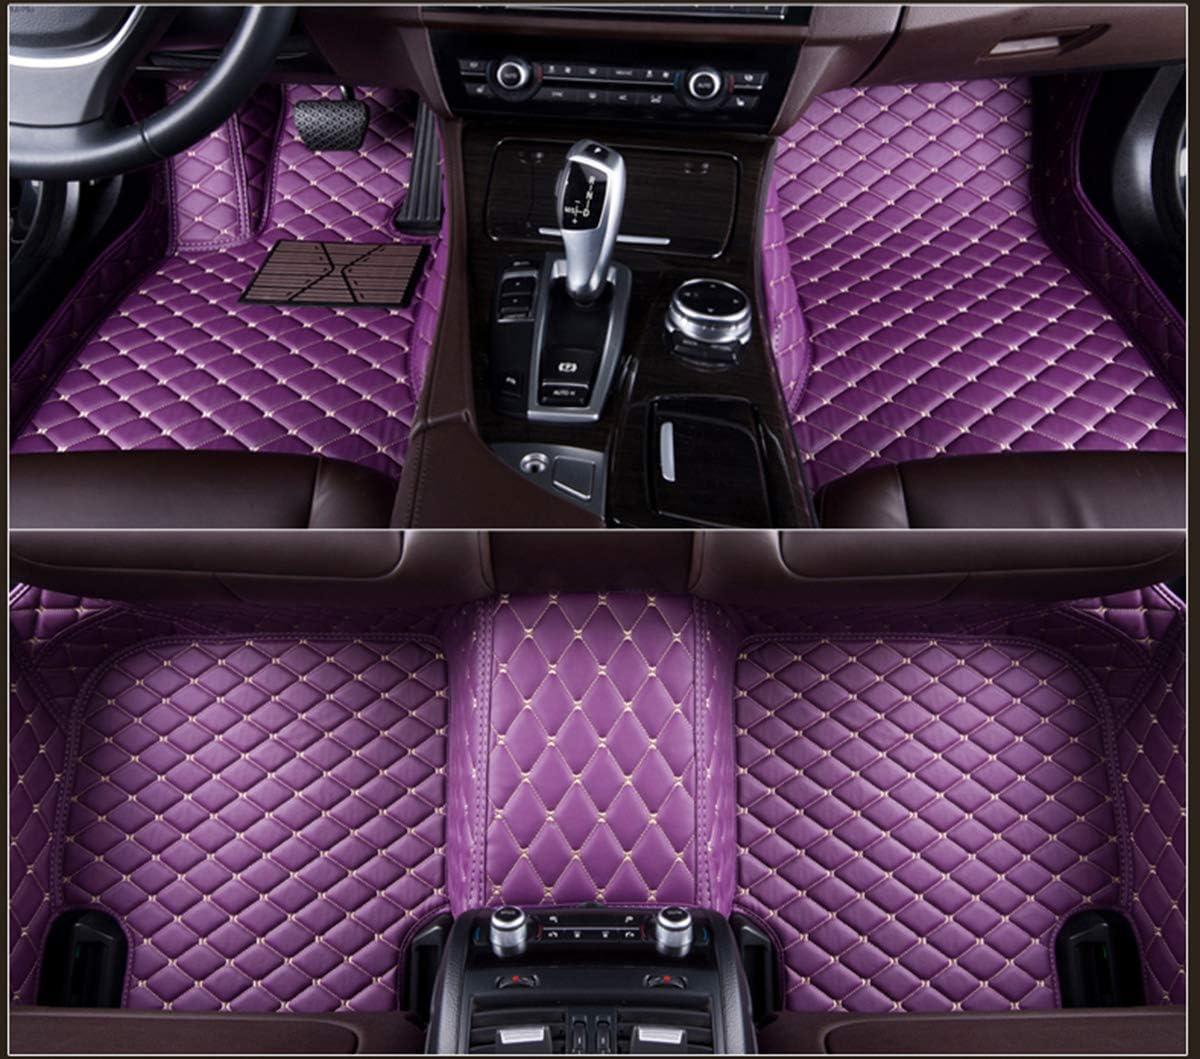 Passenger /& Rear Floor GGBAILEY D60355-S1A-CC-CHAR Custom Fit Car Mats for 2018 Land Range Rover Velar Charcoal Driver